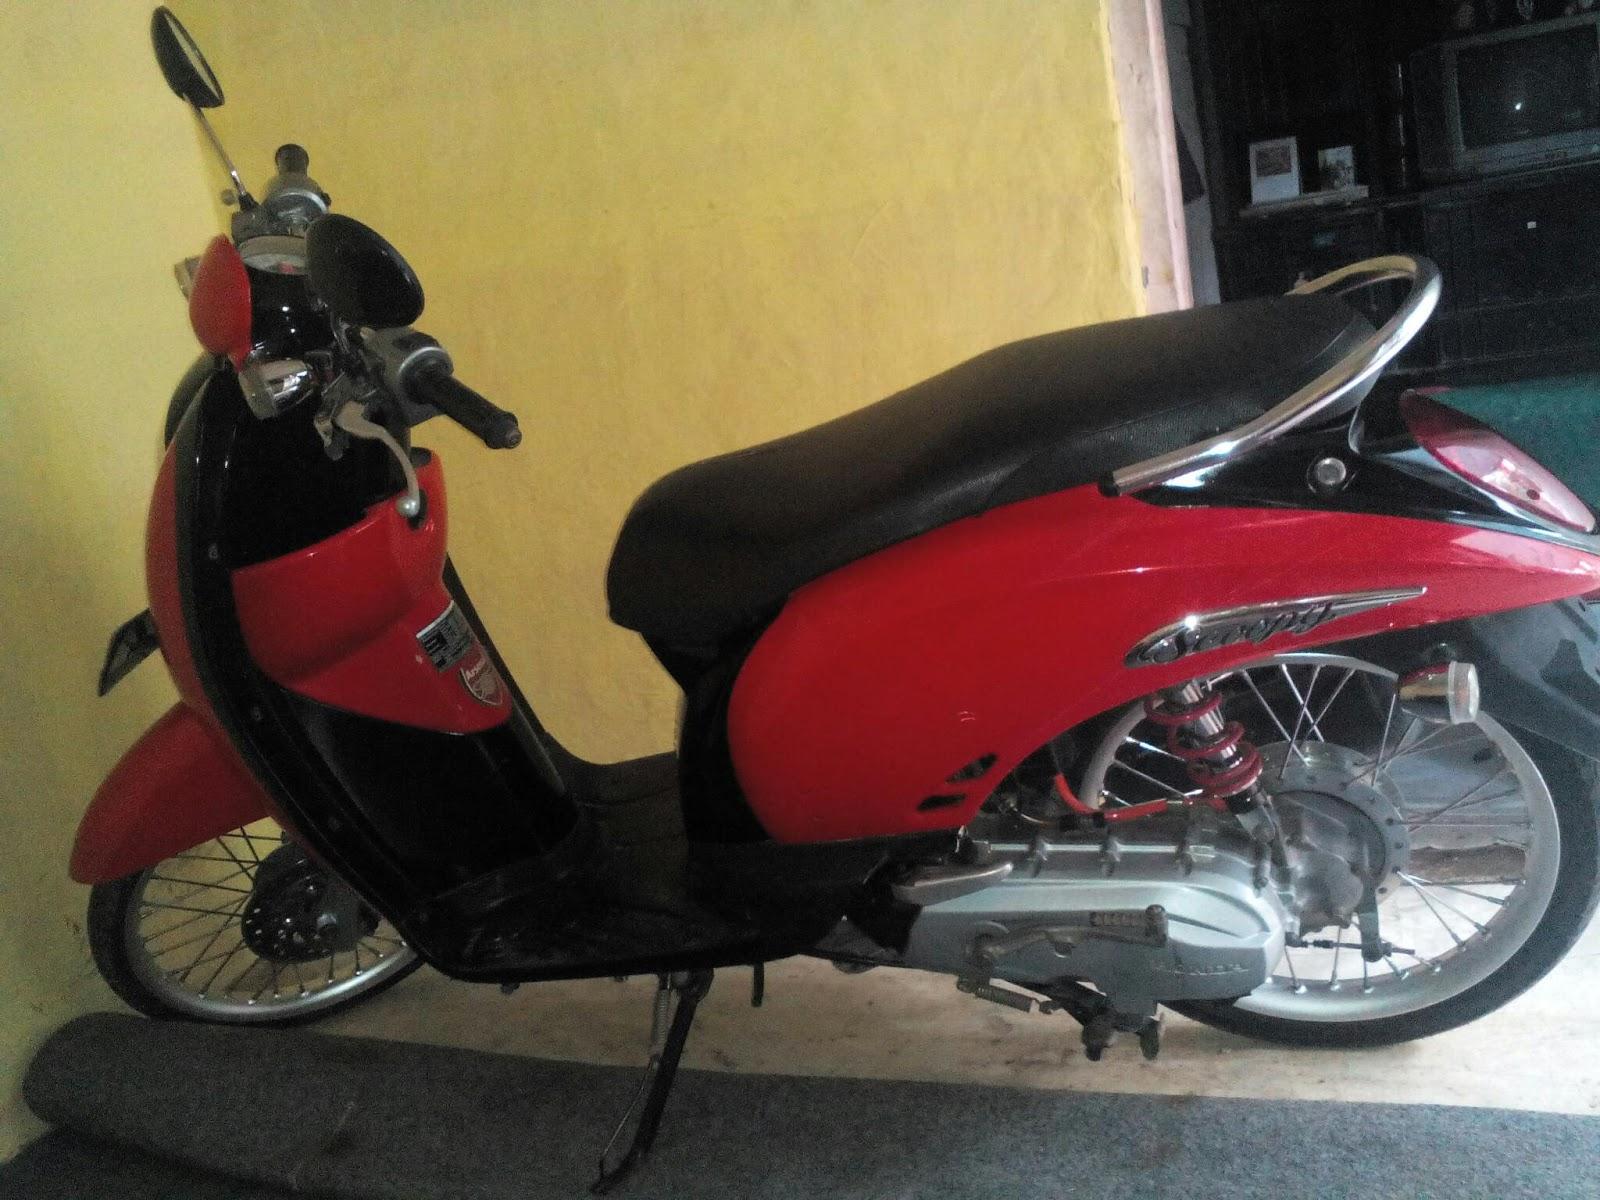 94 Modifikasi Motor Scoopy Warna Hitam Merah Terlengkap Kumbara